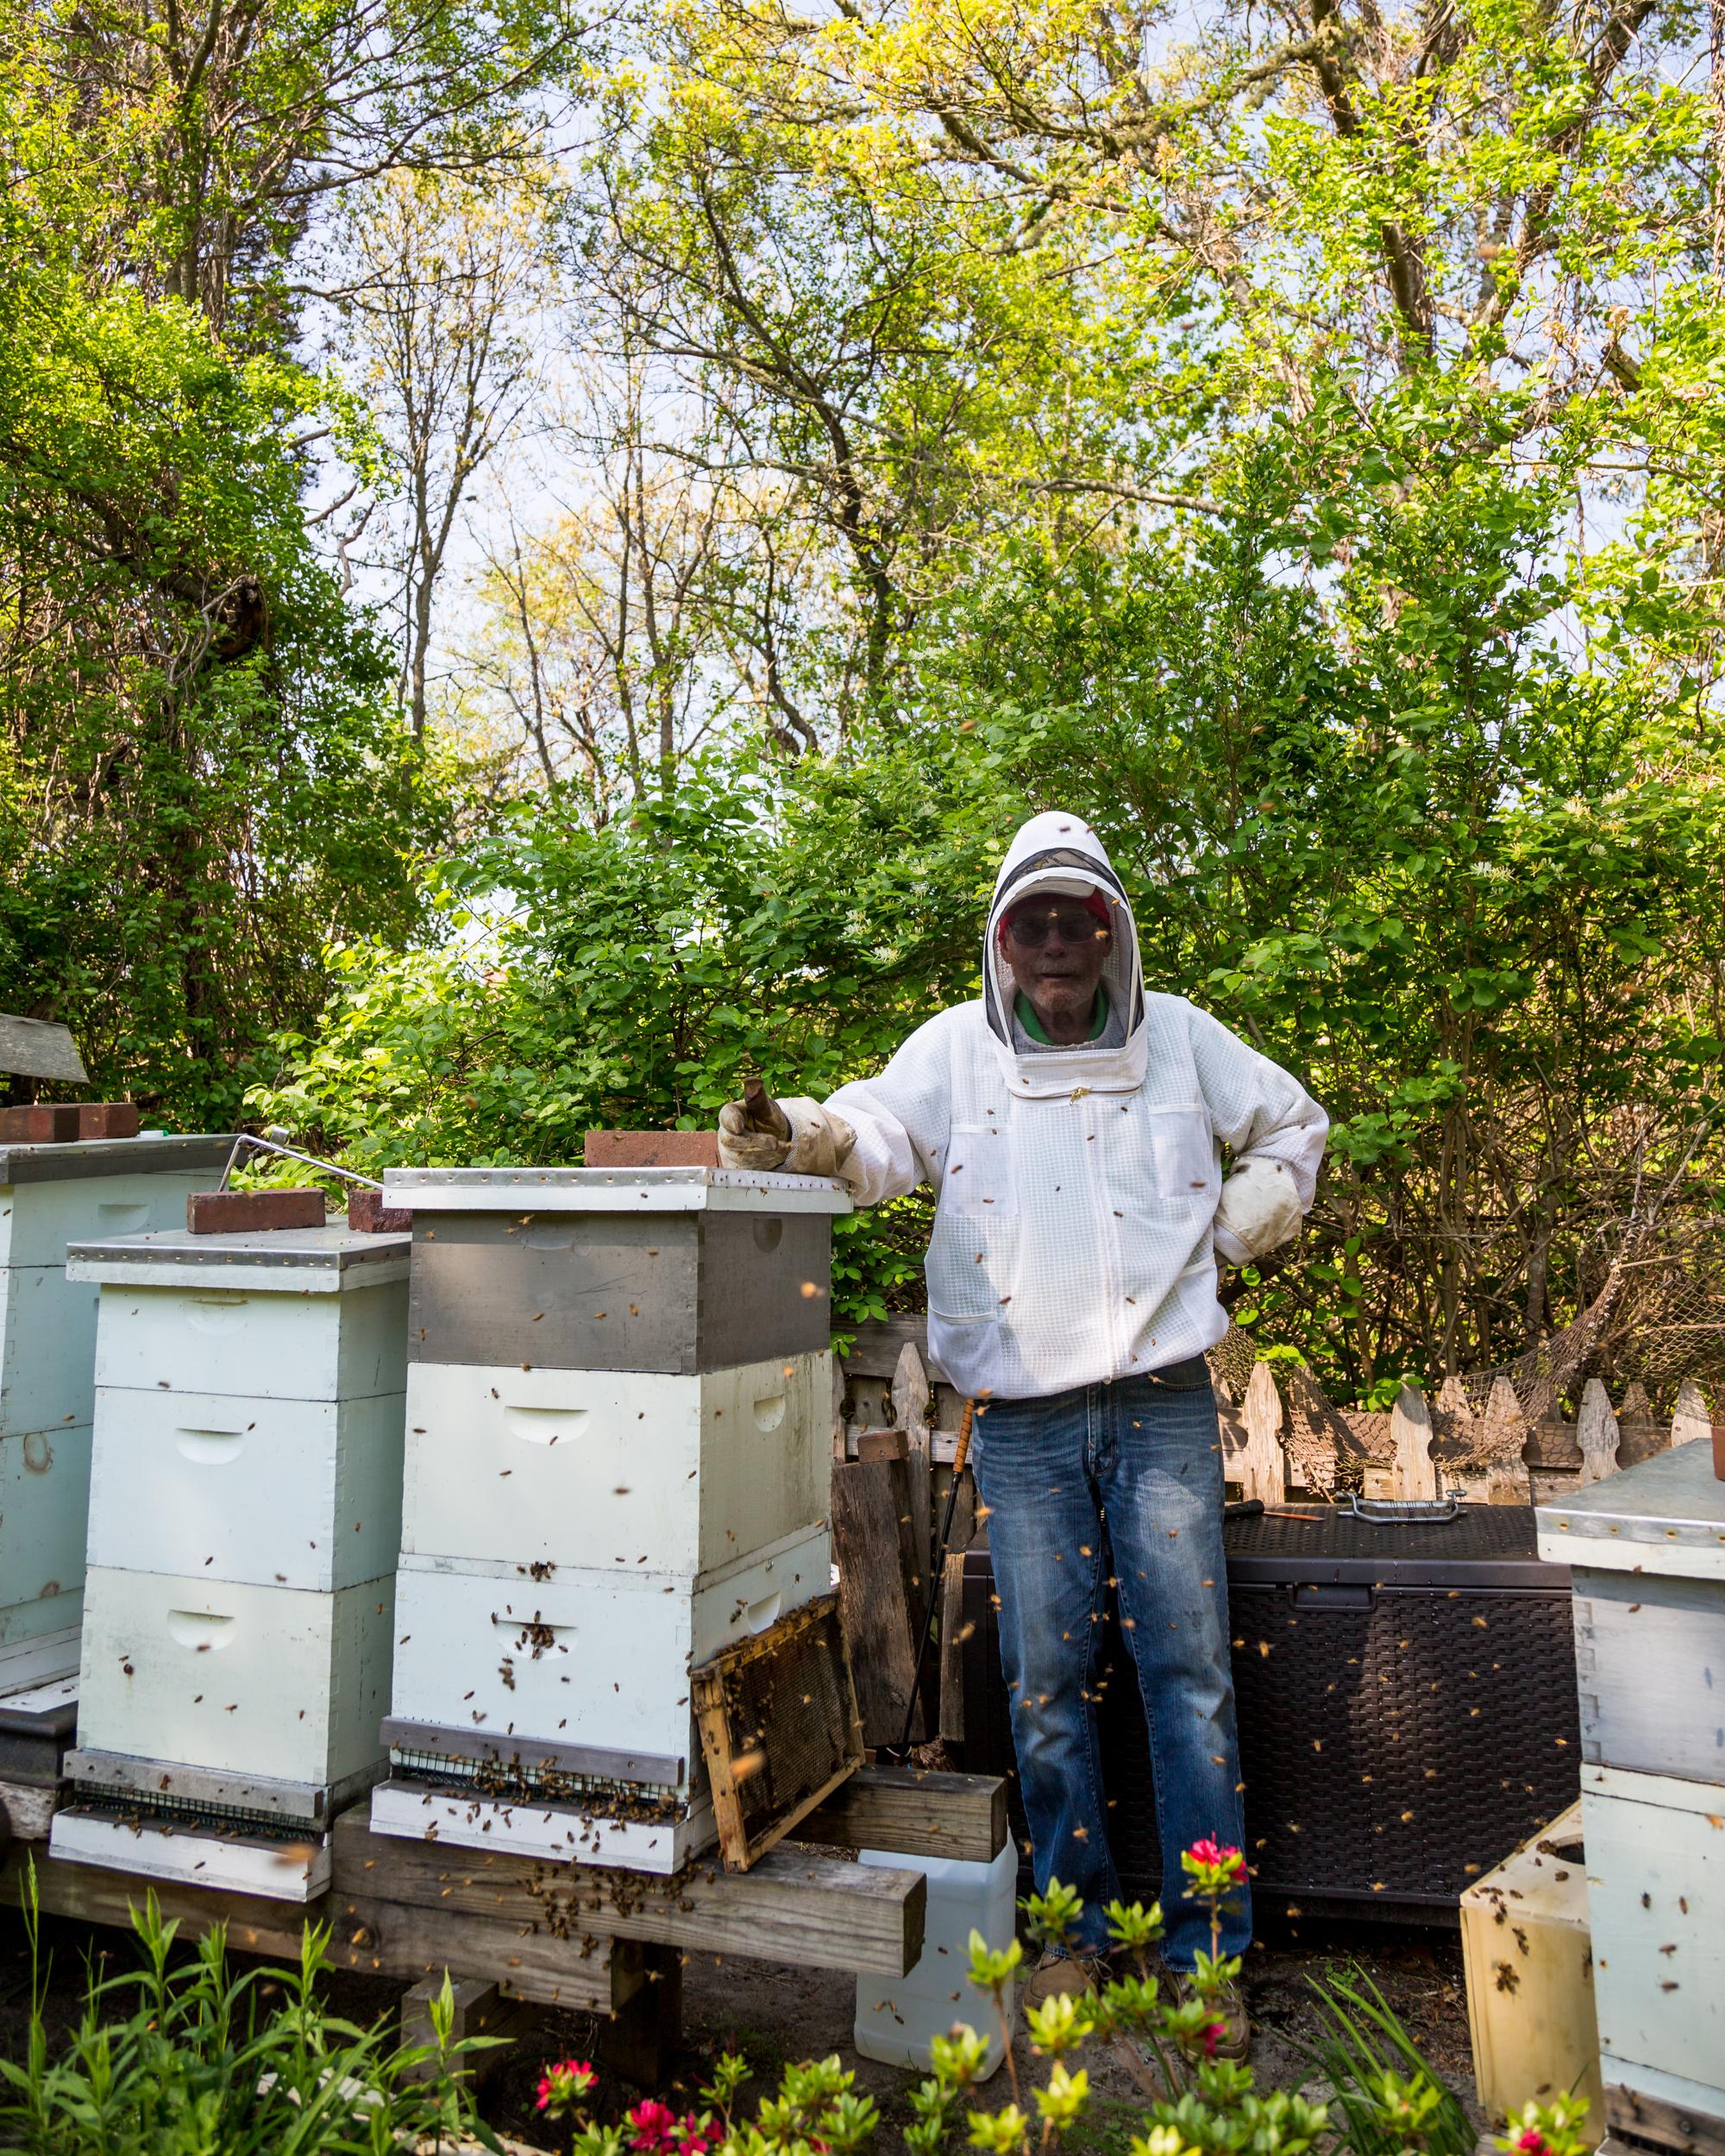 Beekeeper-24.jpg